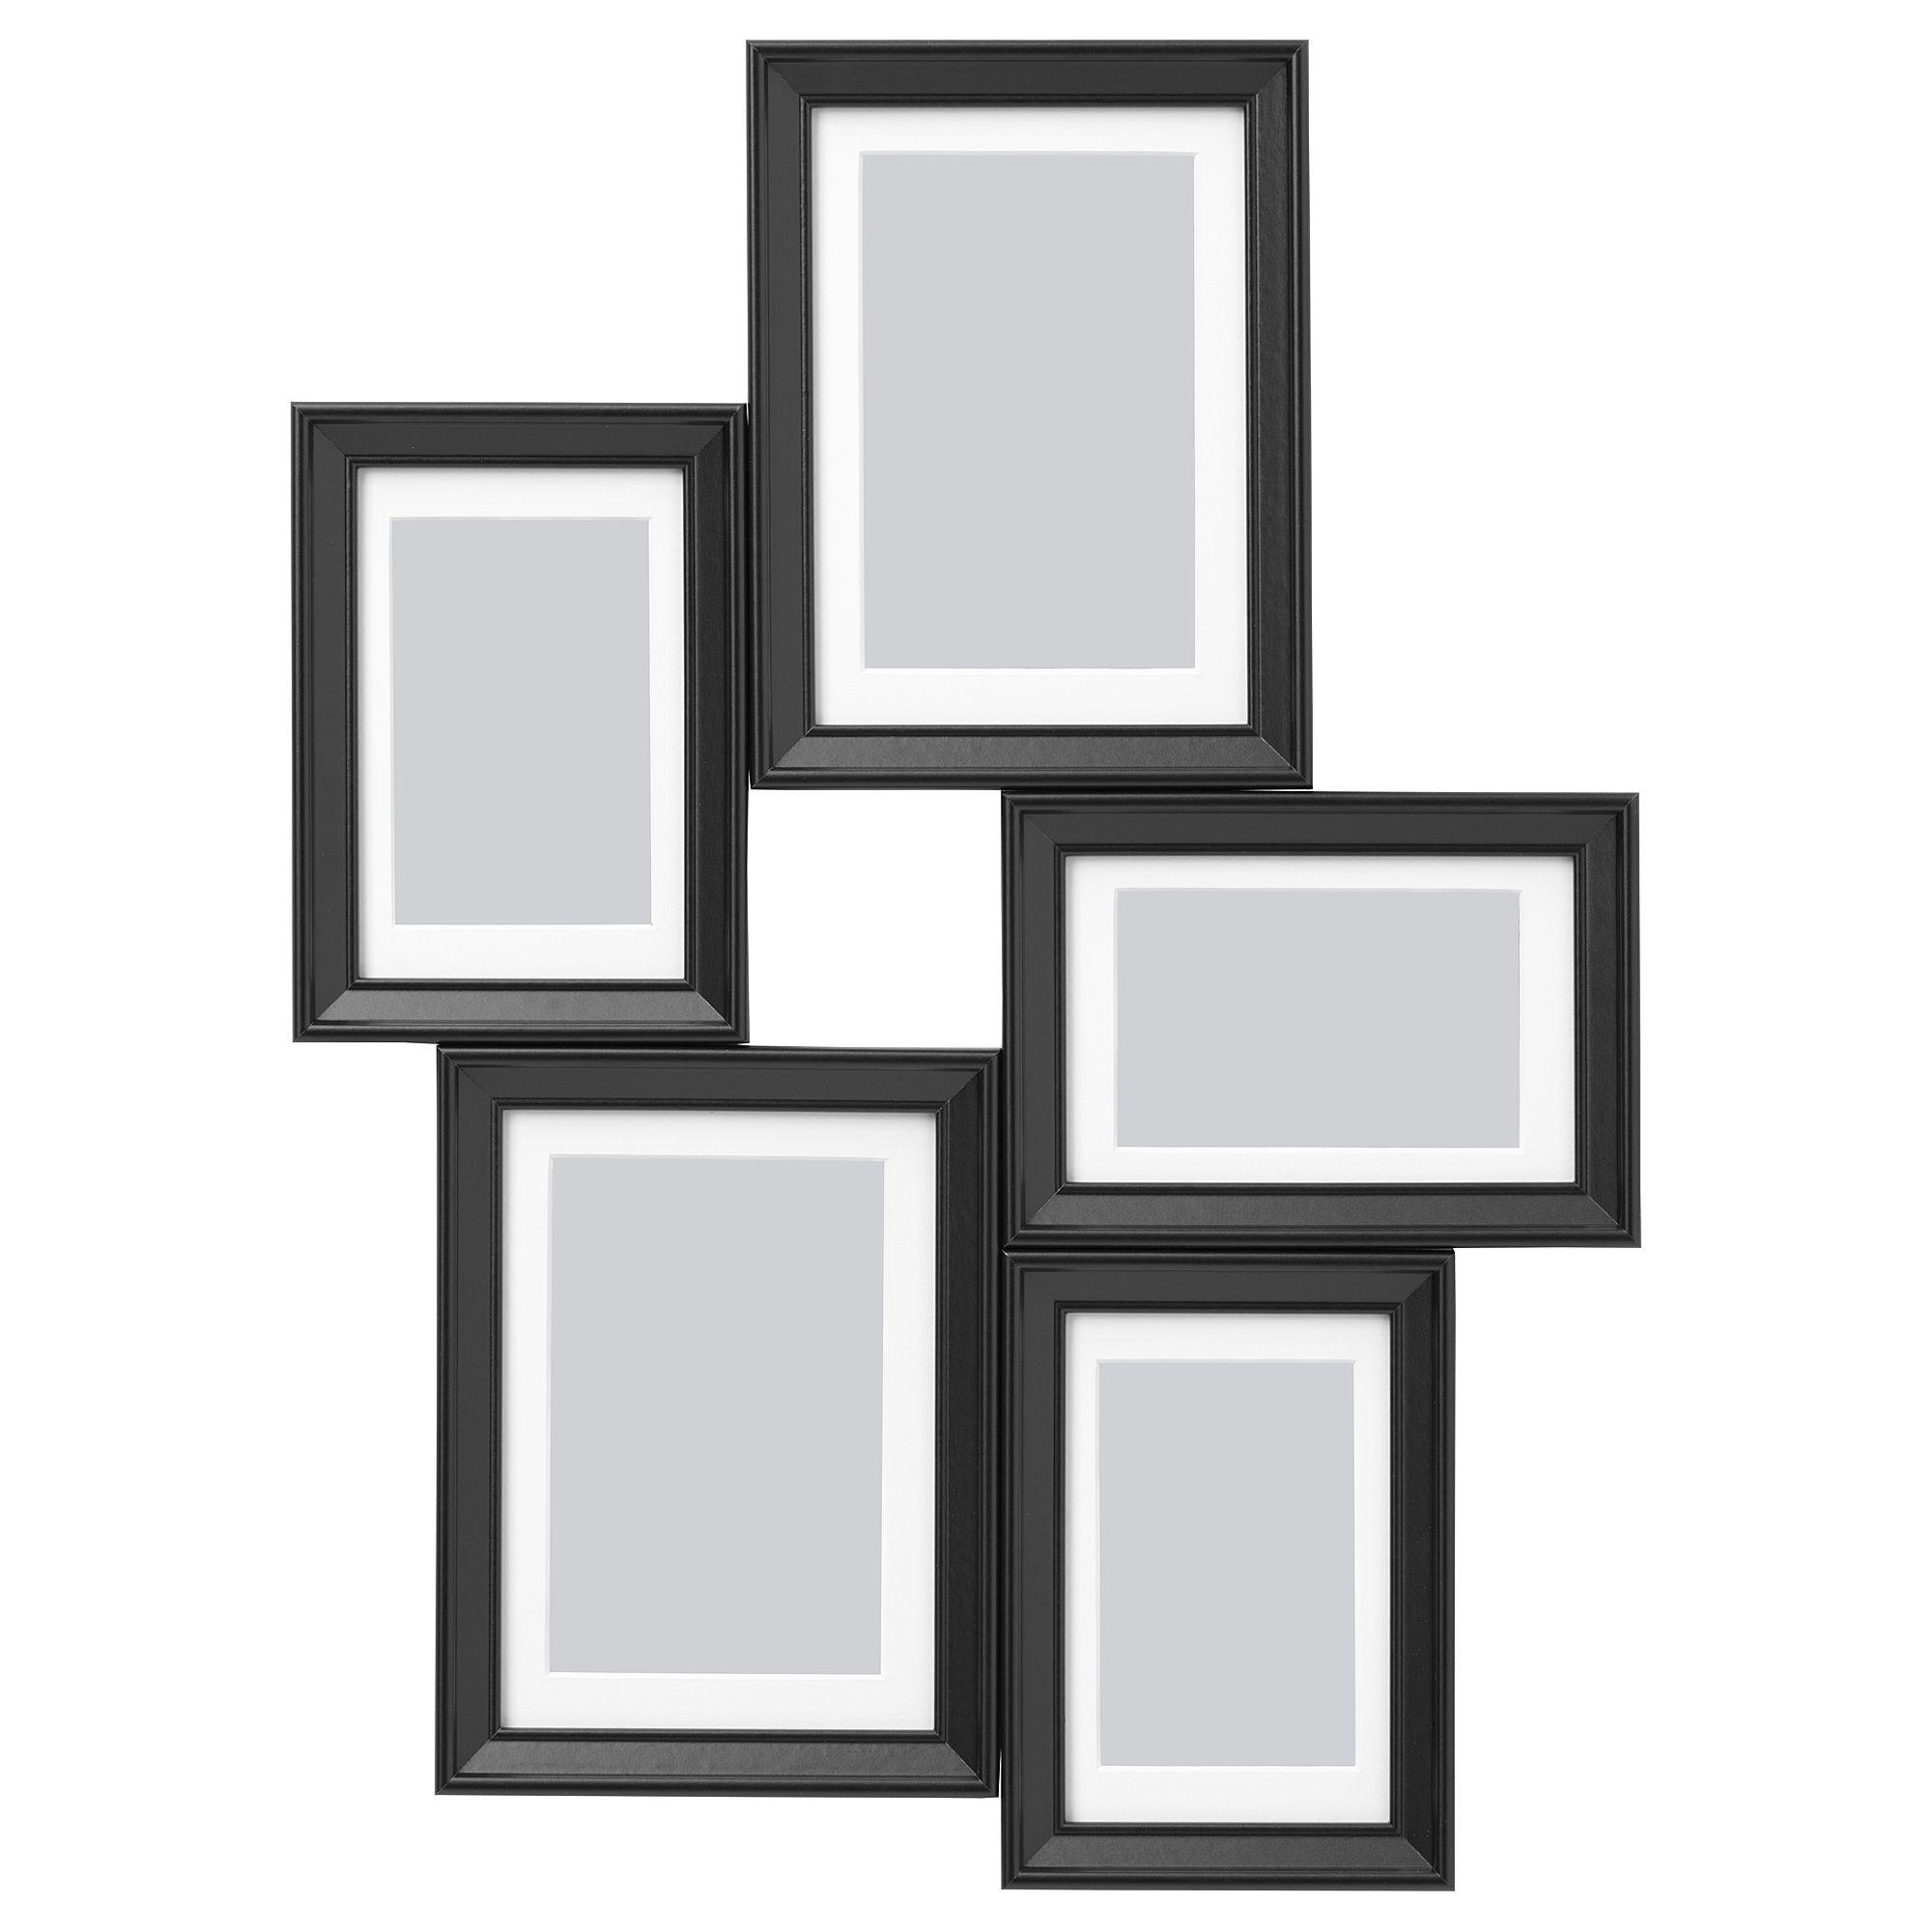 IKEA växbo blanc collage-Cadre pour 8 photos 13x18cm Cadre Photo Cadre Photo